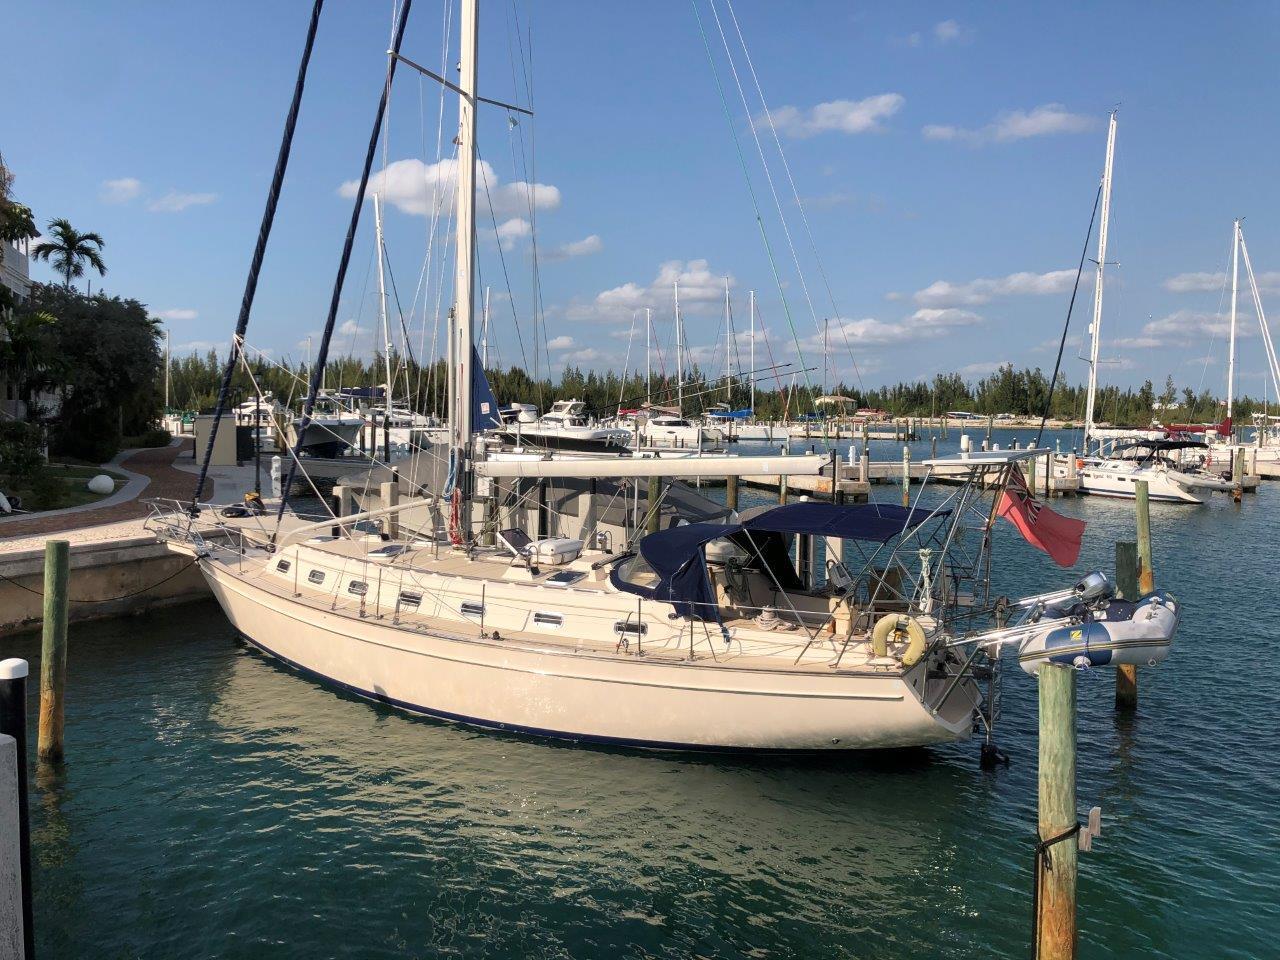 In-mast furling mainsail